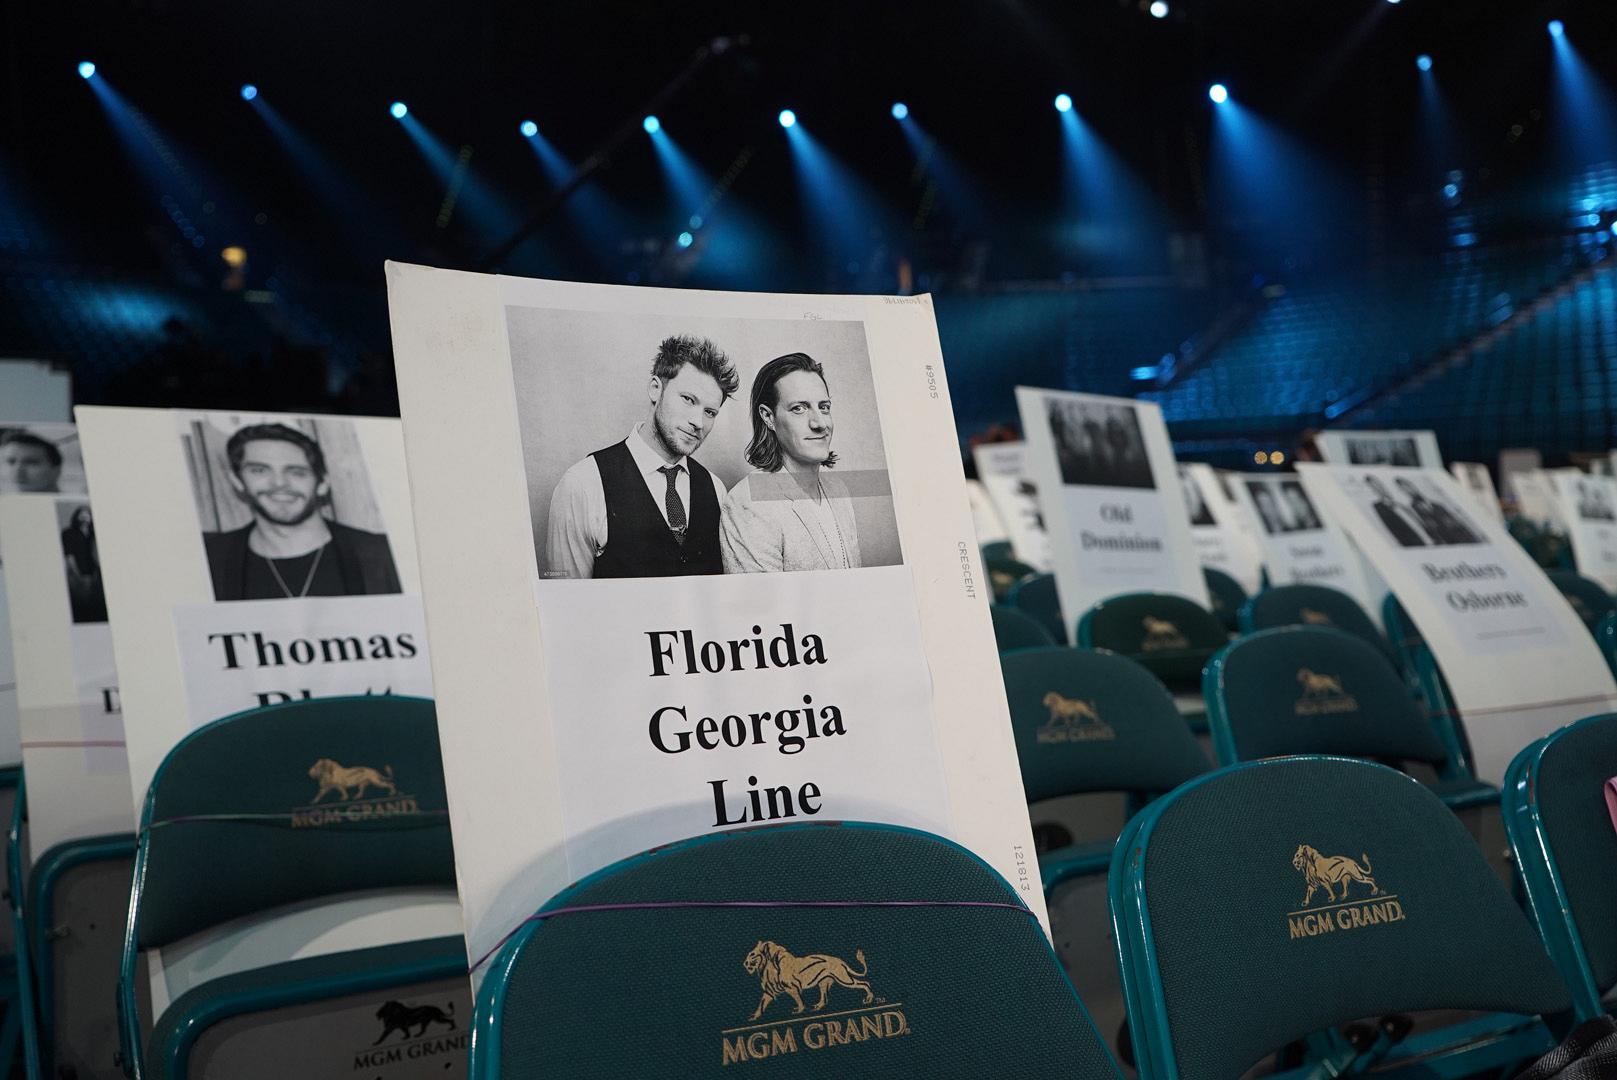 Thomas Rhett and Florida Georgia Line will be cheering from these seats.